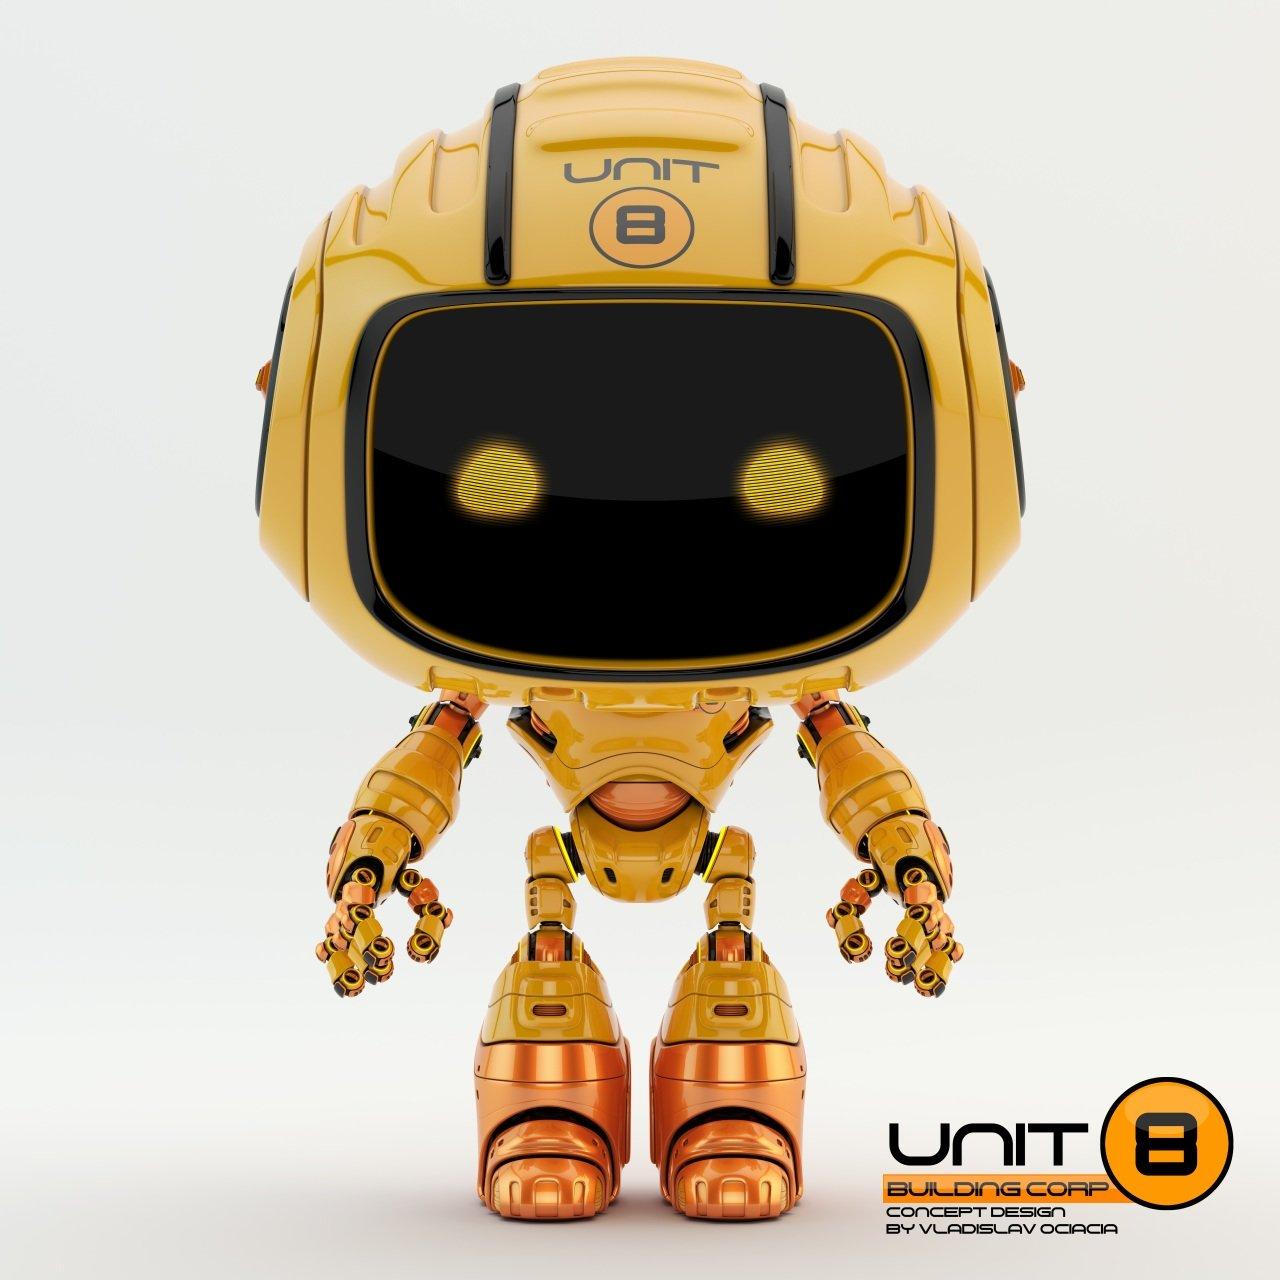 Vladislav ociacia team robot 22